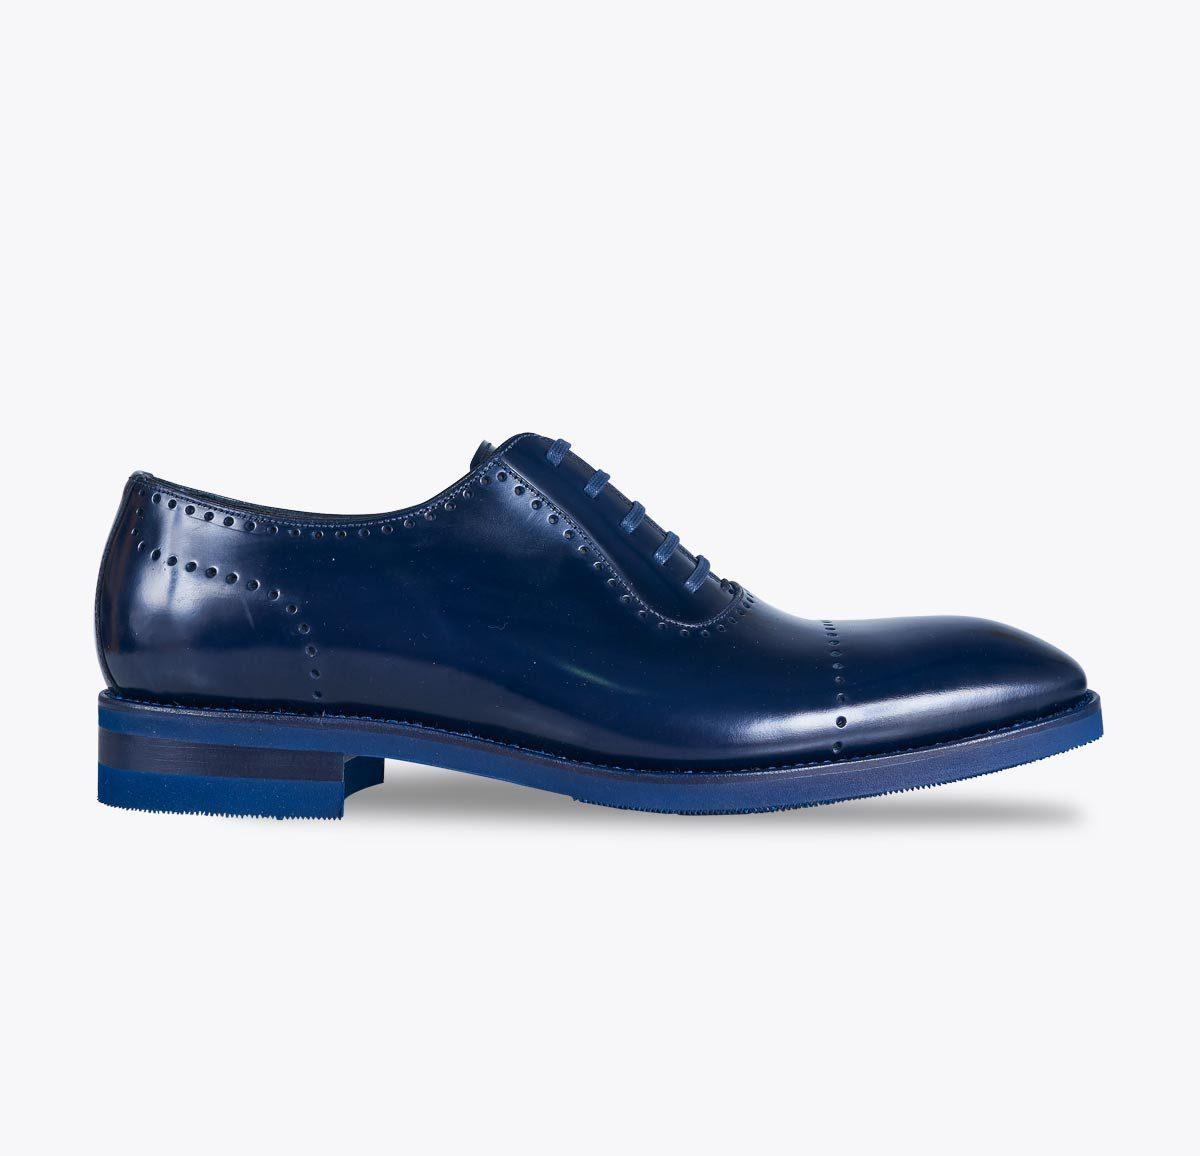 Zapato titanic azul hecho a mano en mandalashoes, Santanyí Mallorca. Hand made shoes. Nach Mass Schuhe